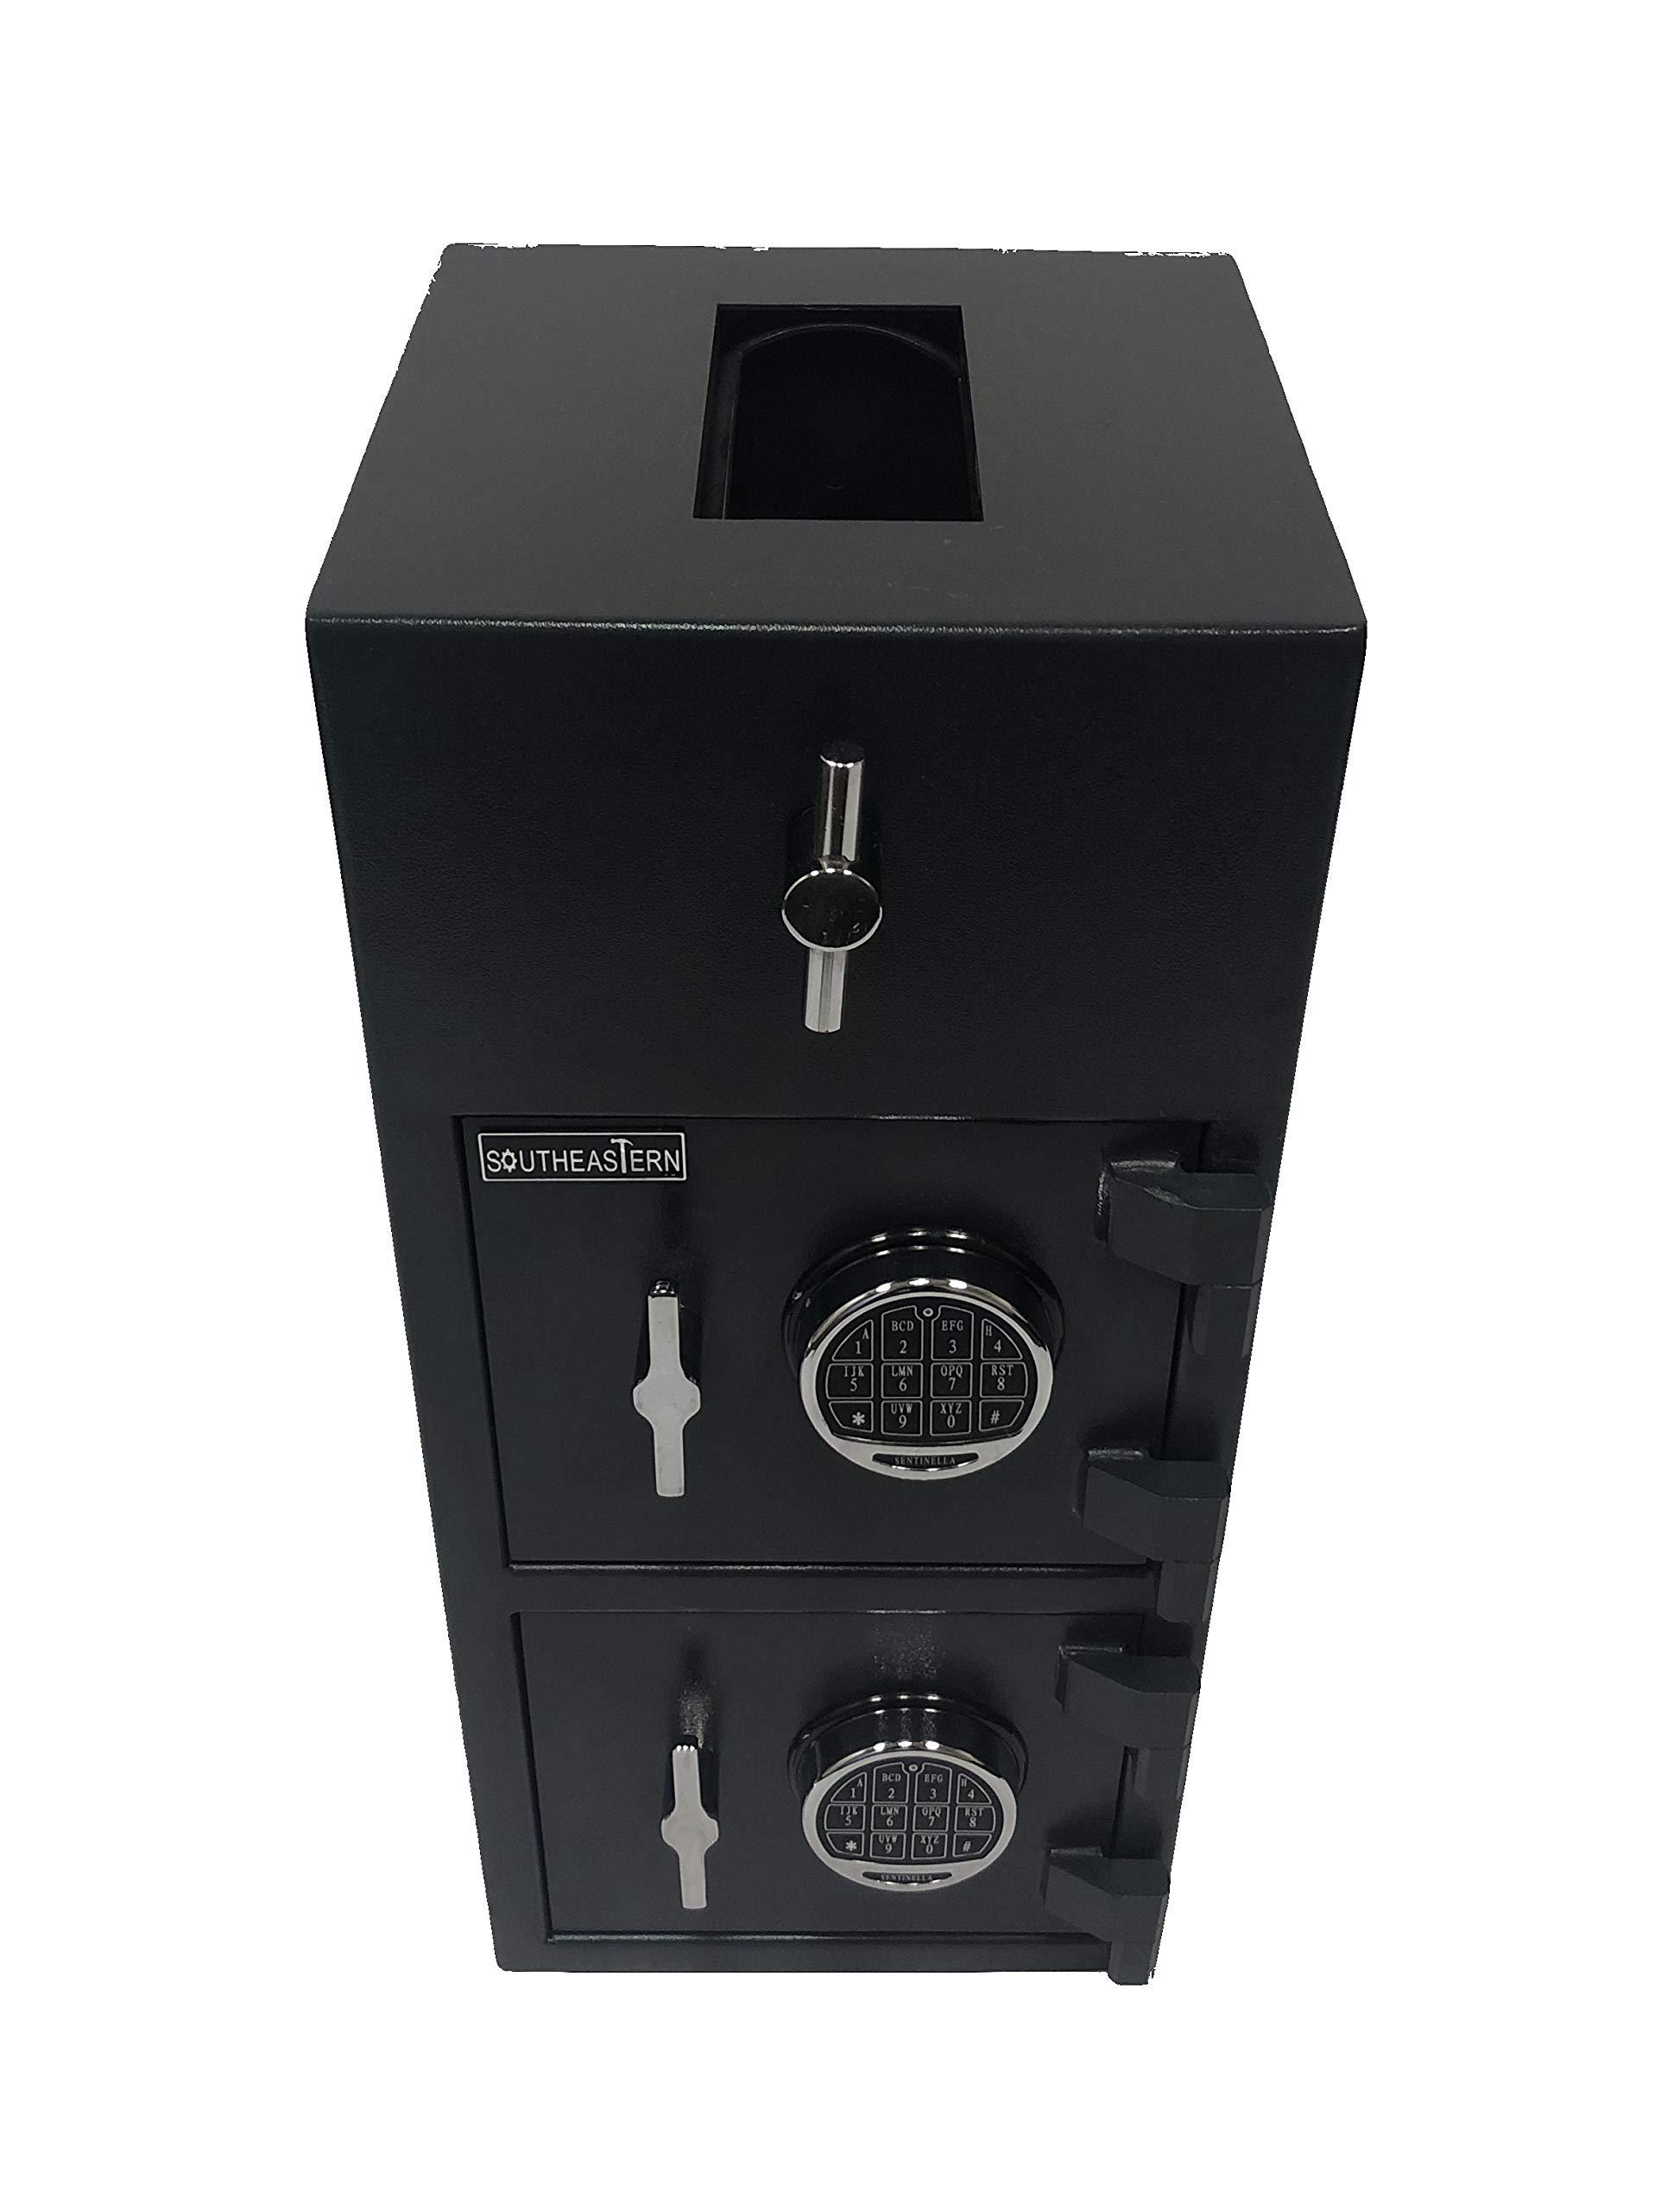 SOUTHEASTERN RH3214EE Top Loading Double Door Drop Slot Depository Safe with Quick Digital Lock